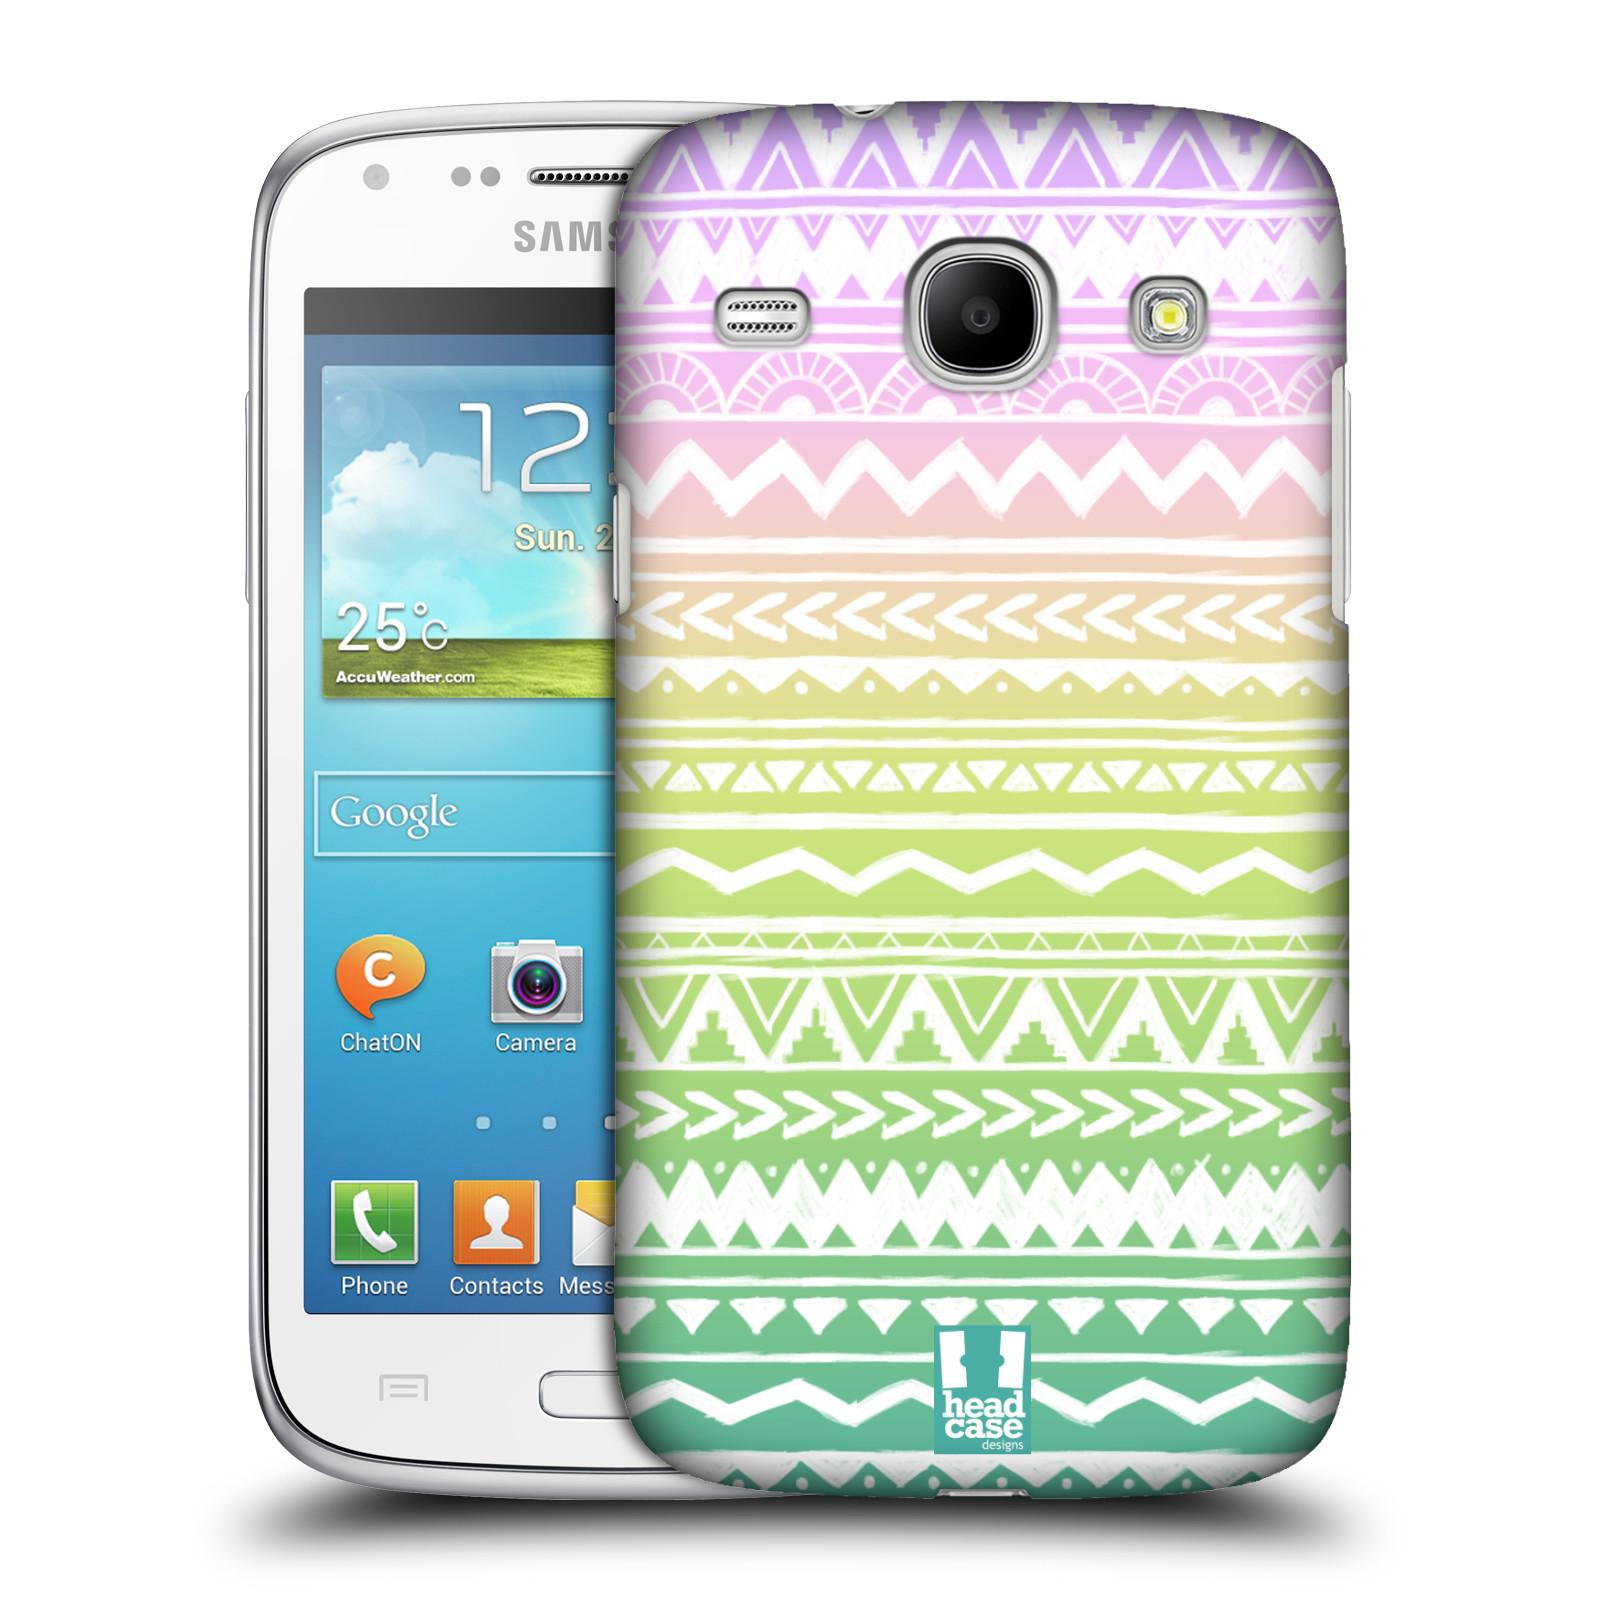 Galaxy Core I8260 Price in Pakistan Samsung Galaxy Core I8260